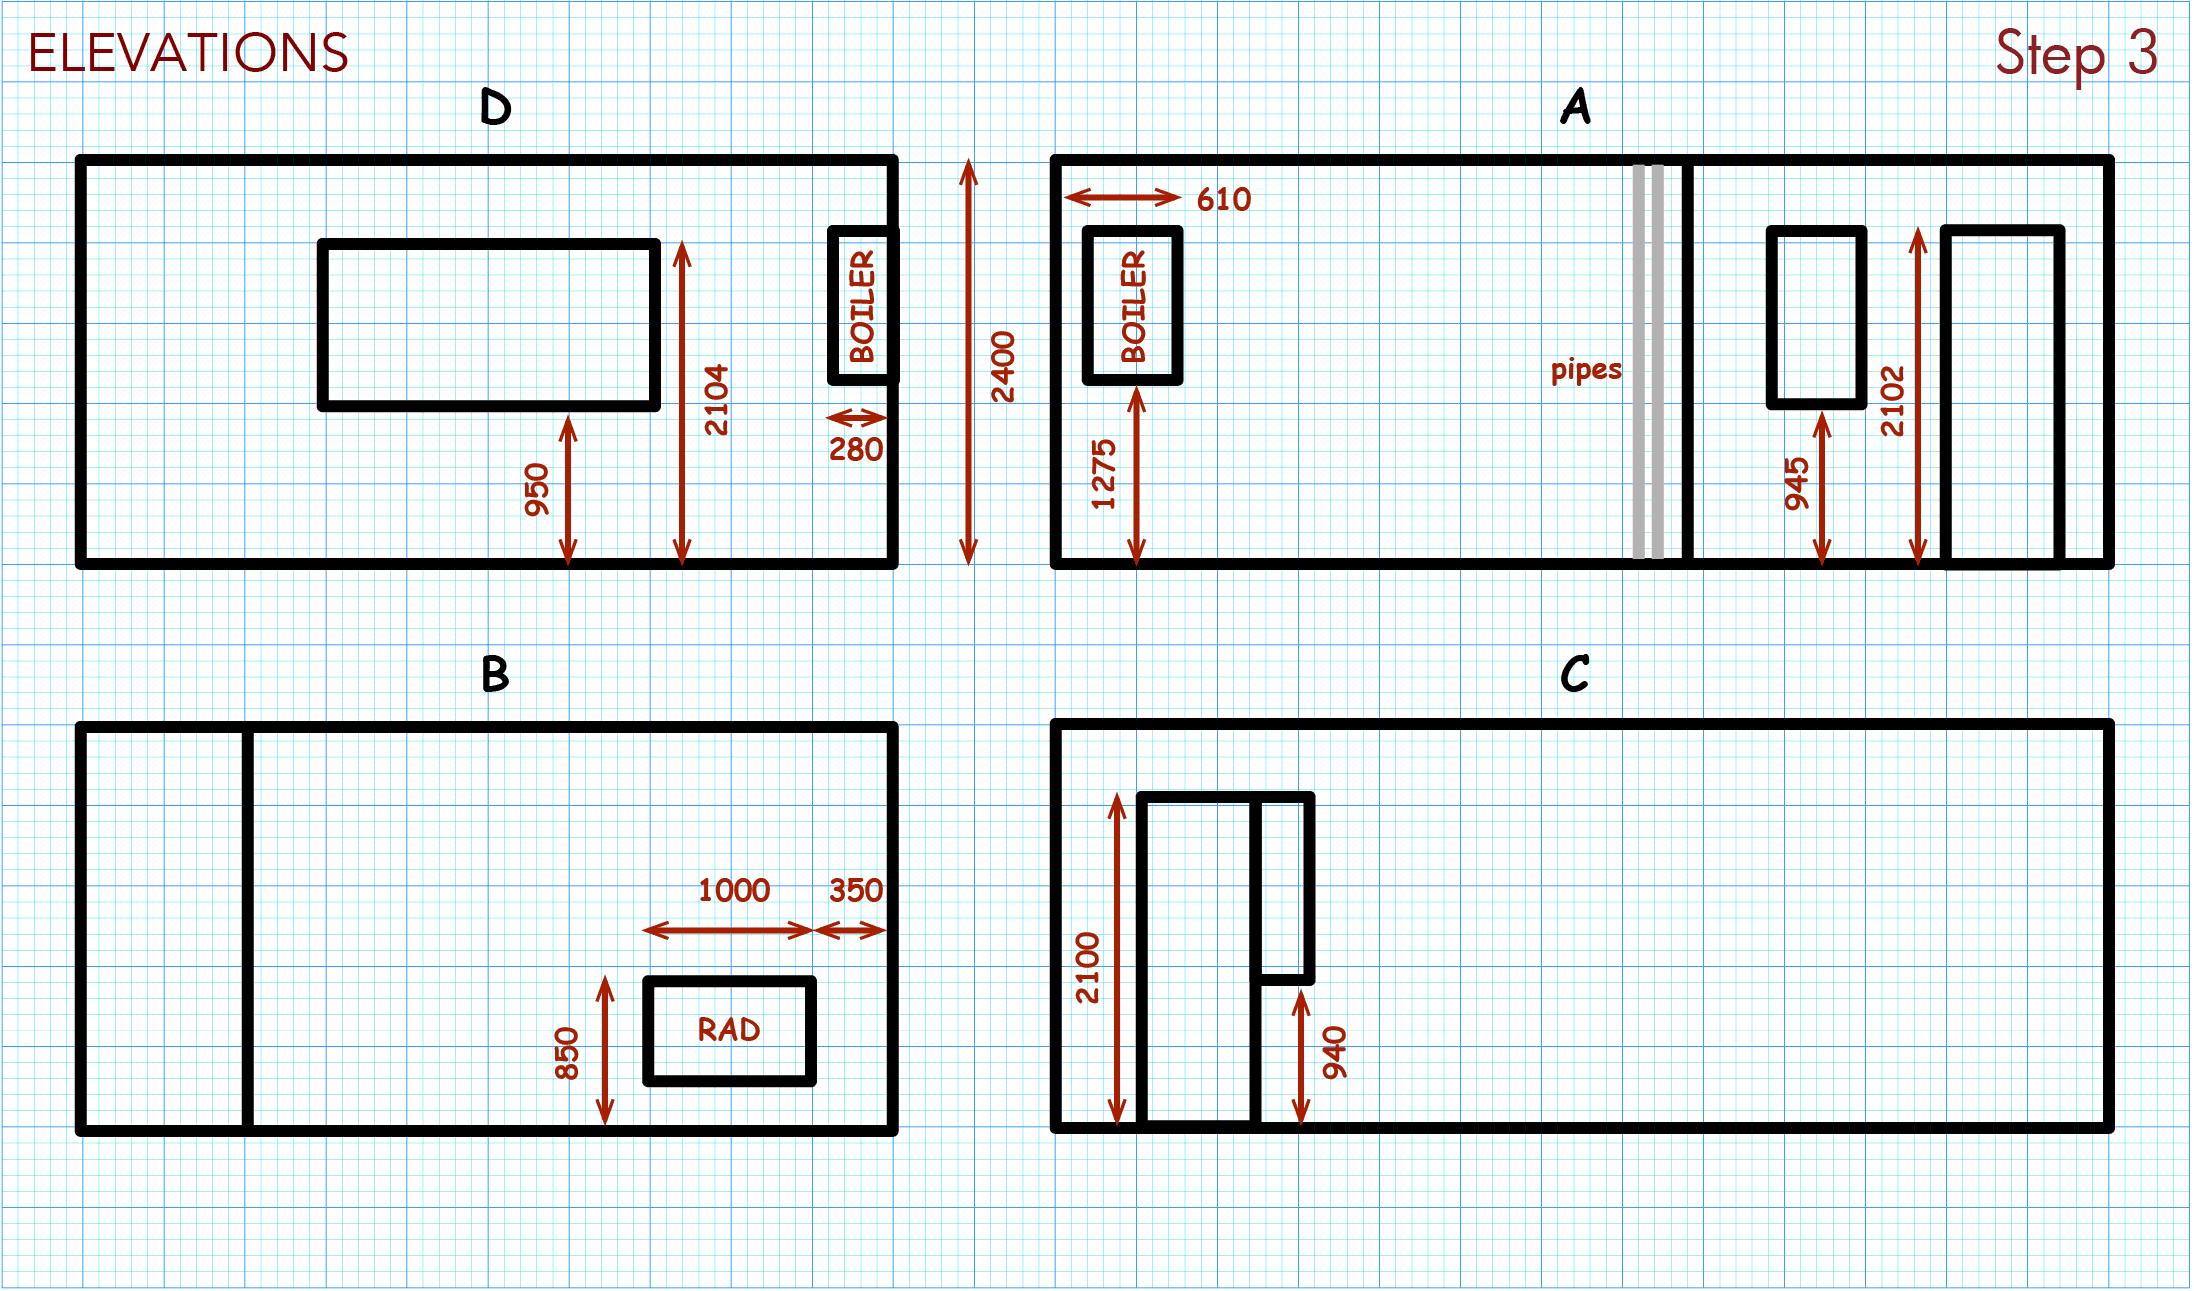 Add elevation measurements